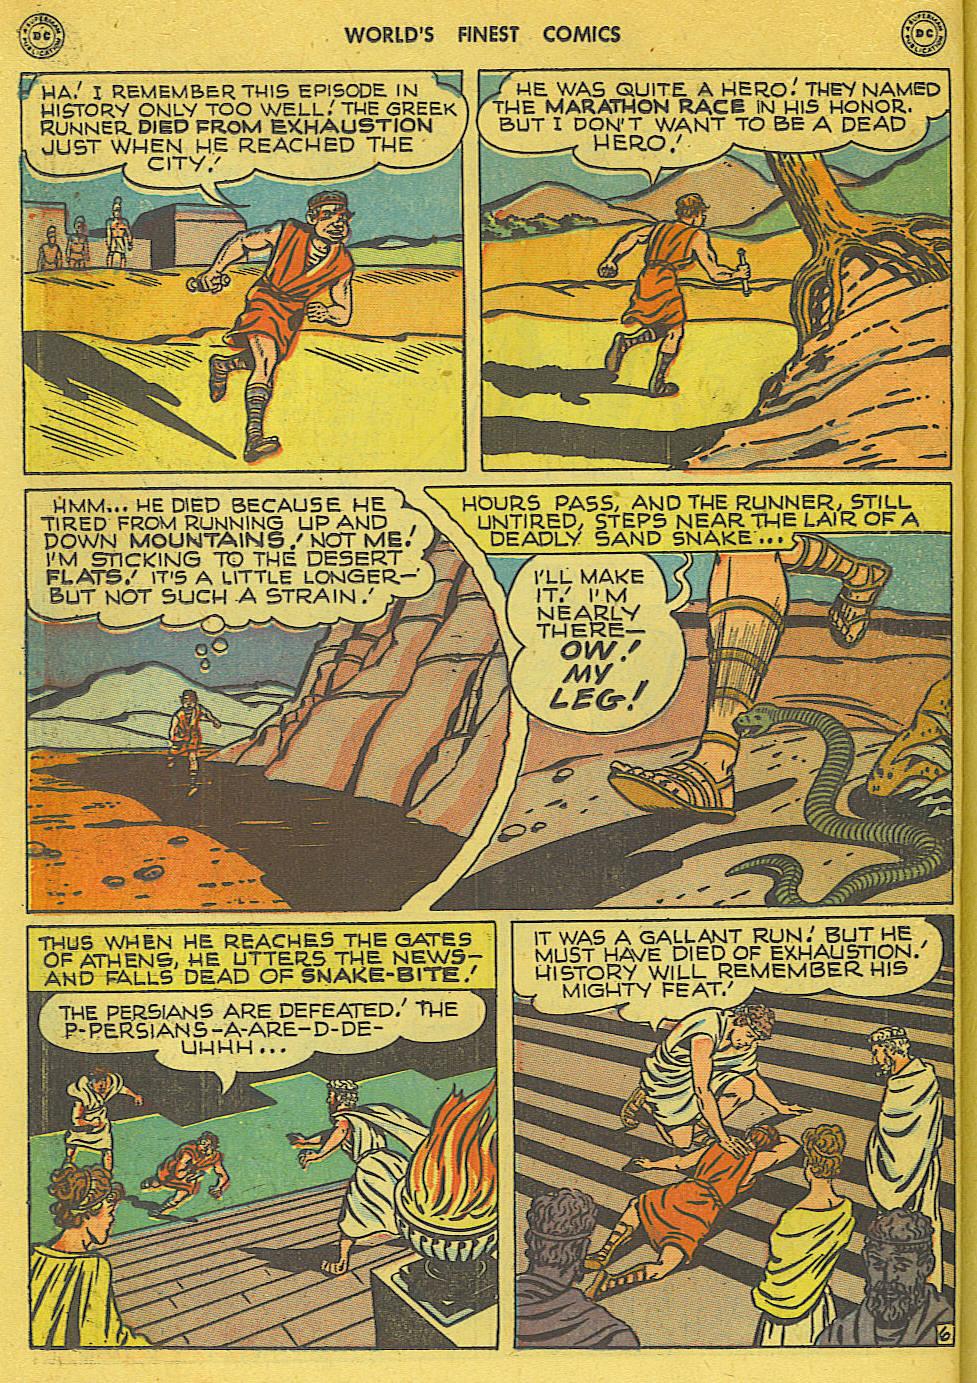 Read online World's Finest Comics comic -  Issue #34 - 32